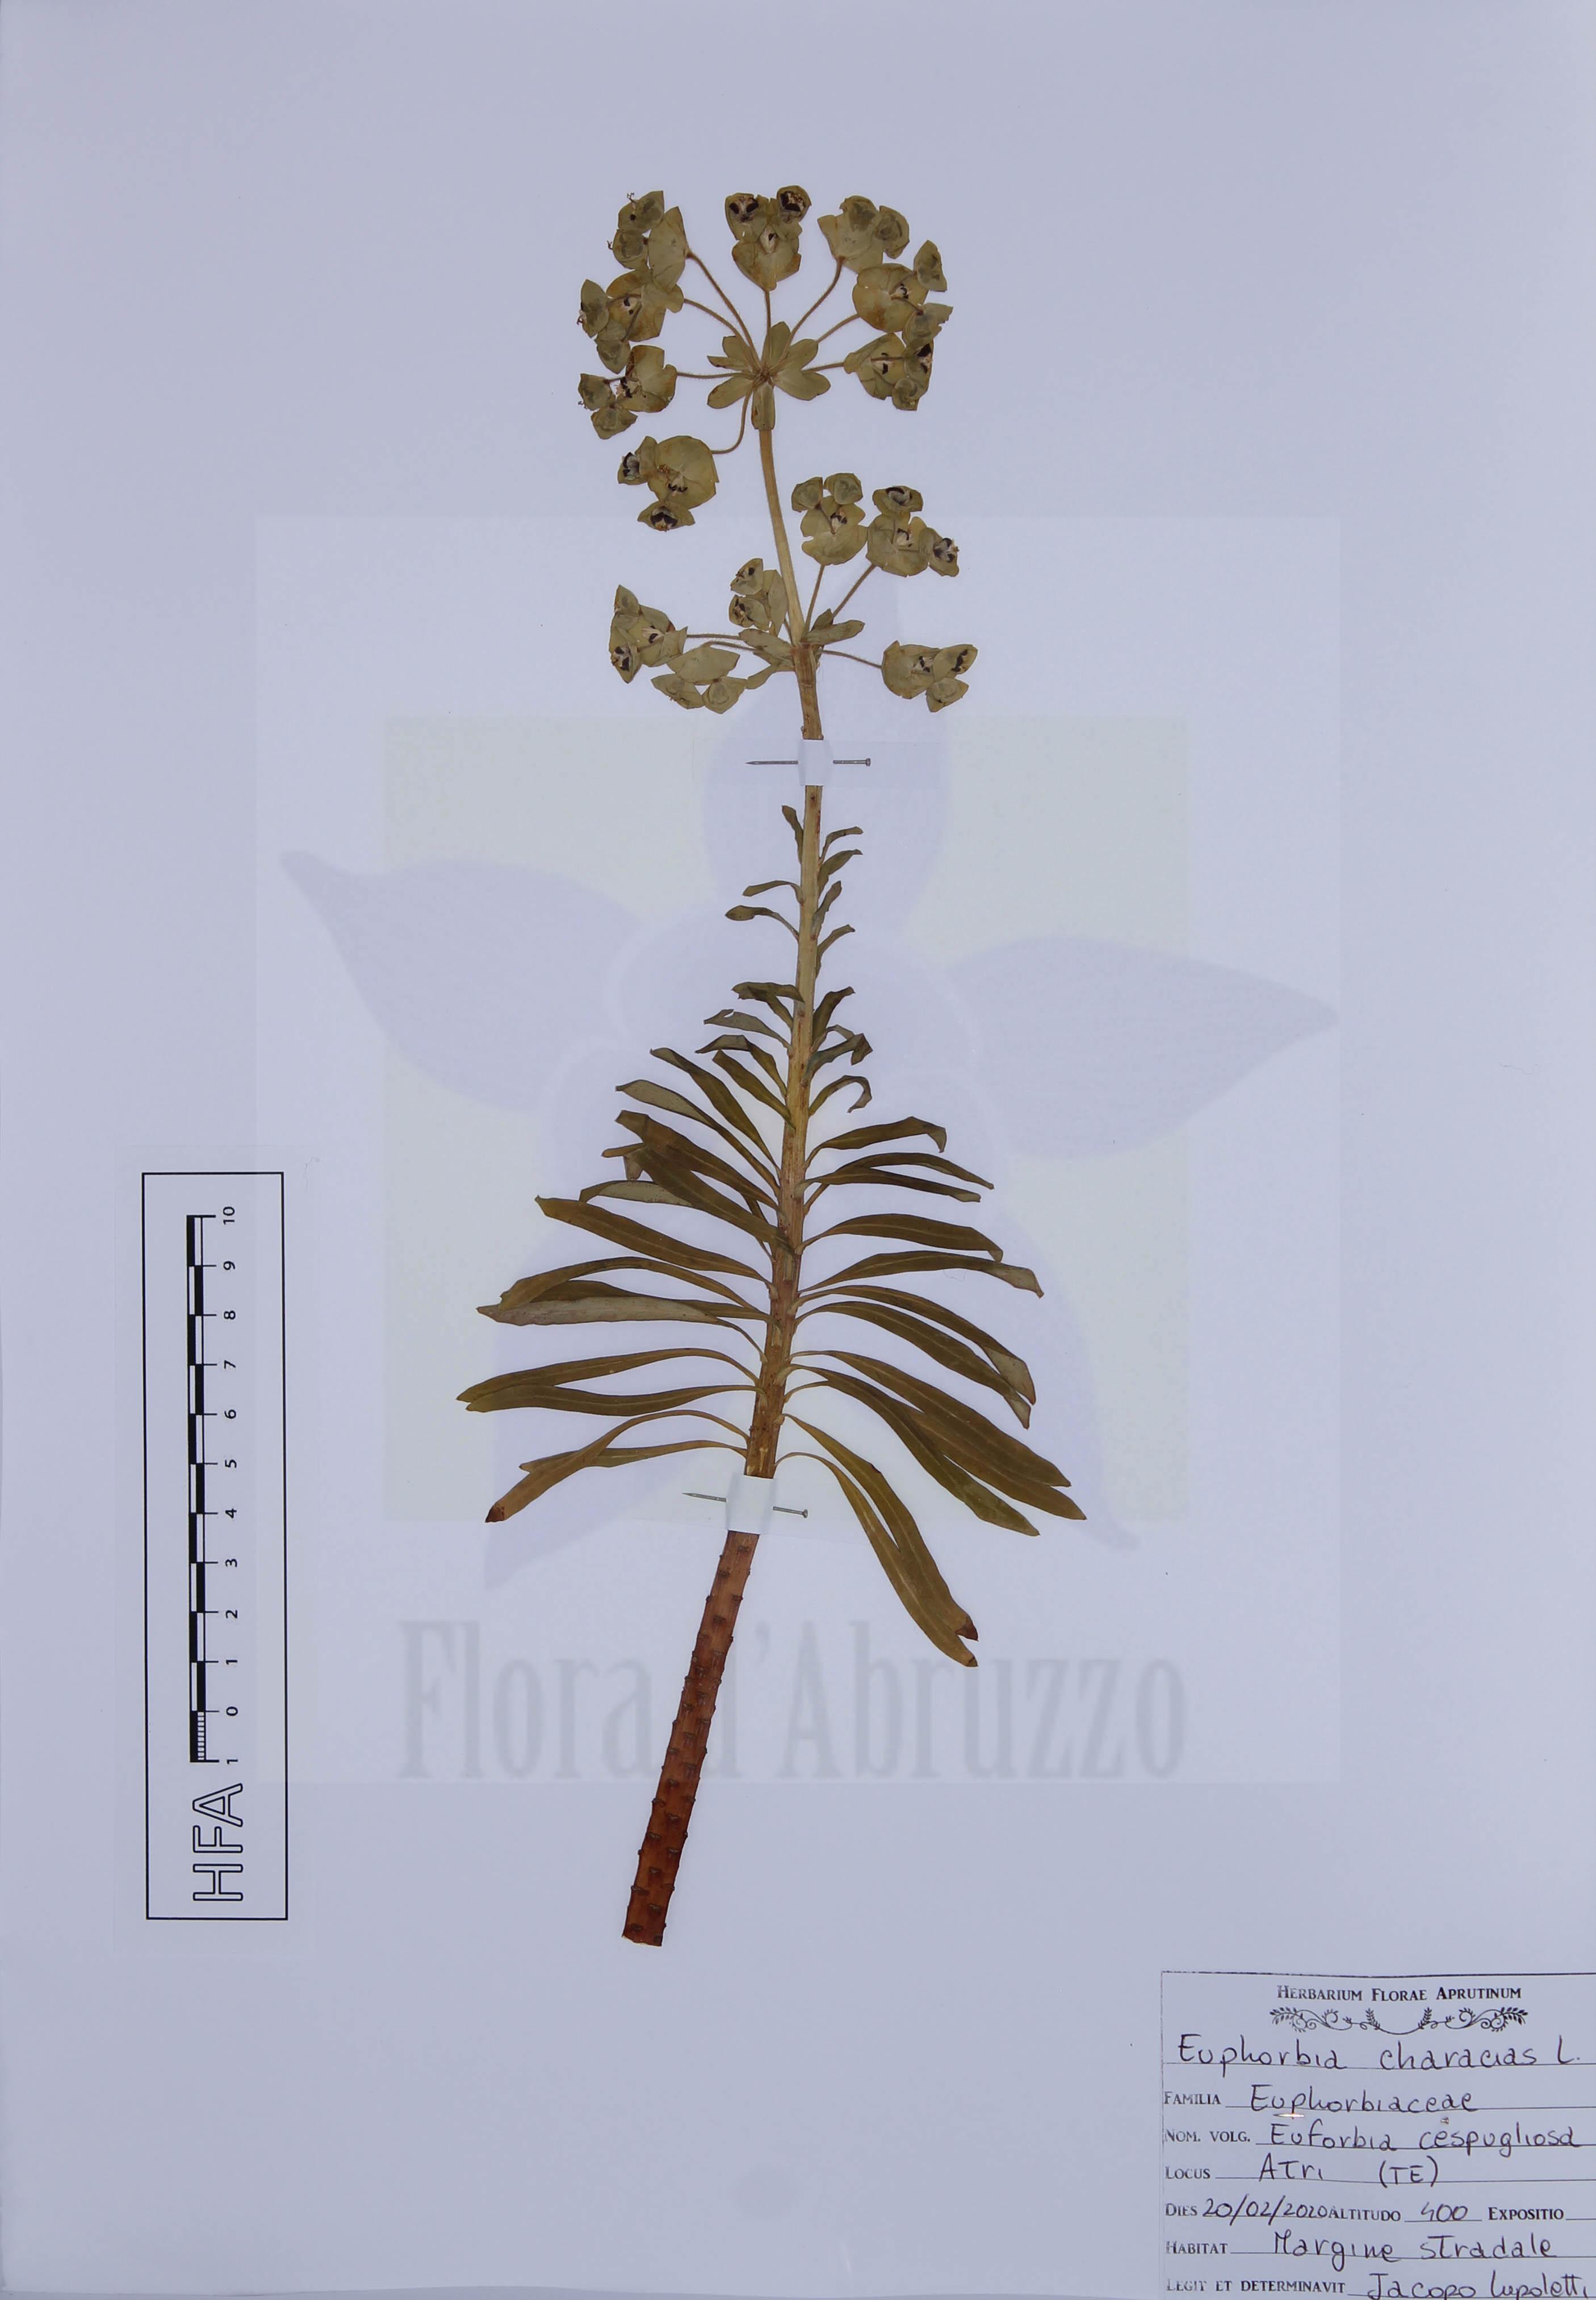 Euphorbia characias L.